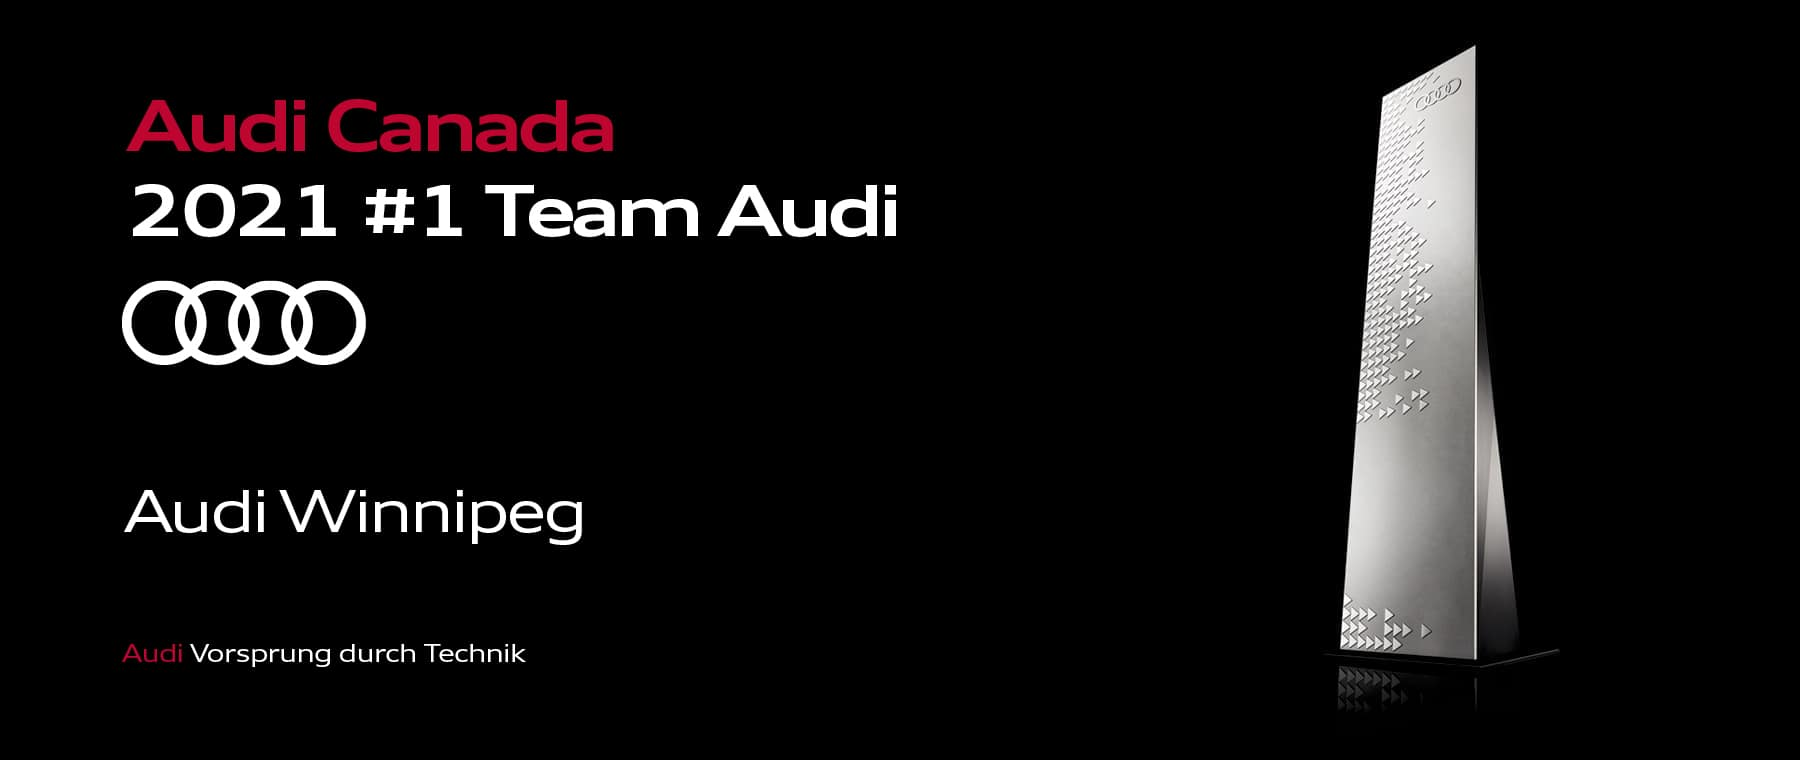 #1 Team Audi